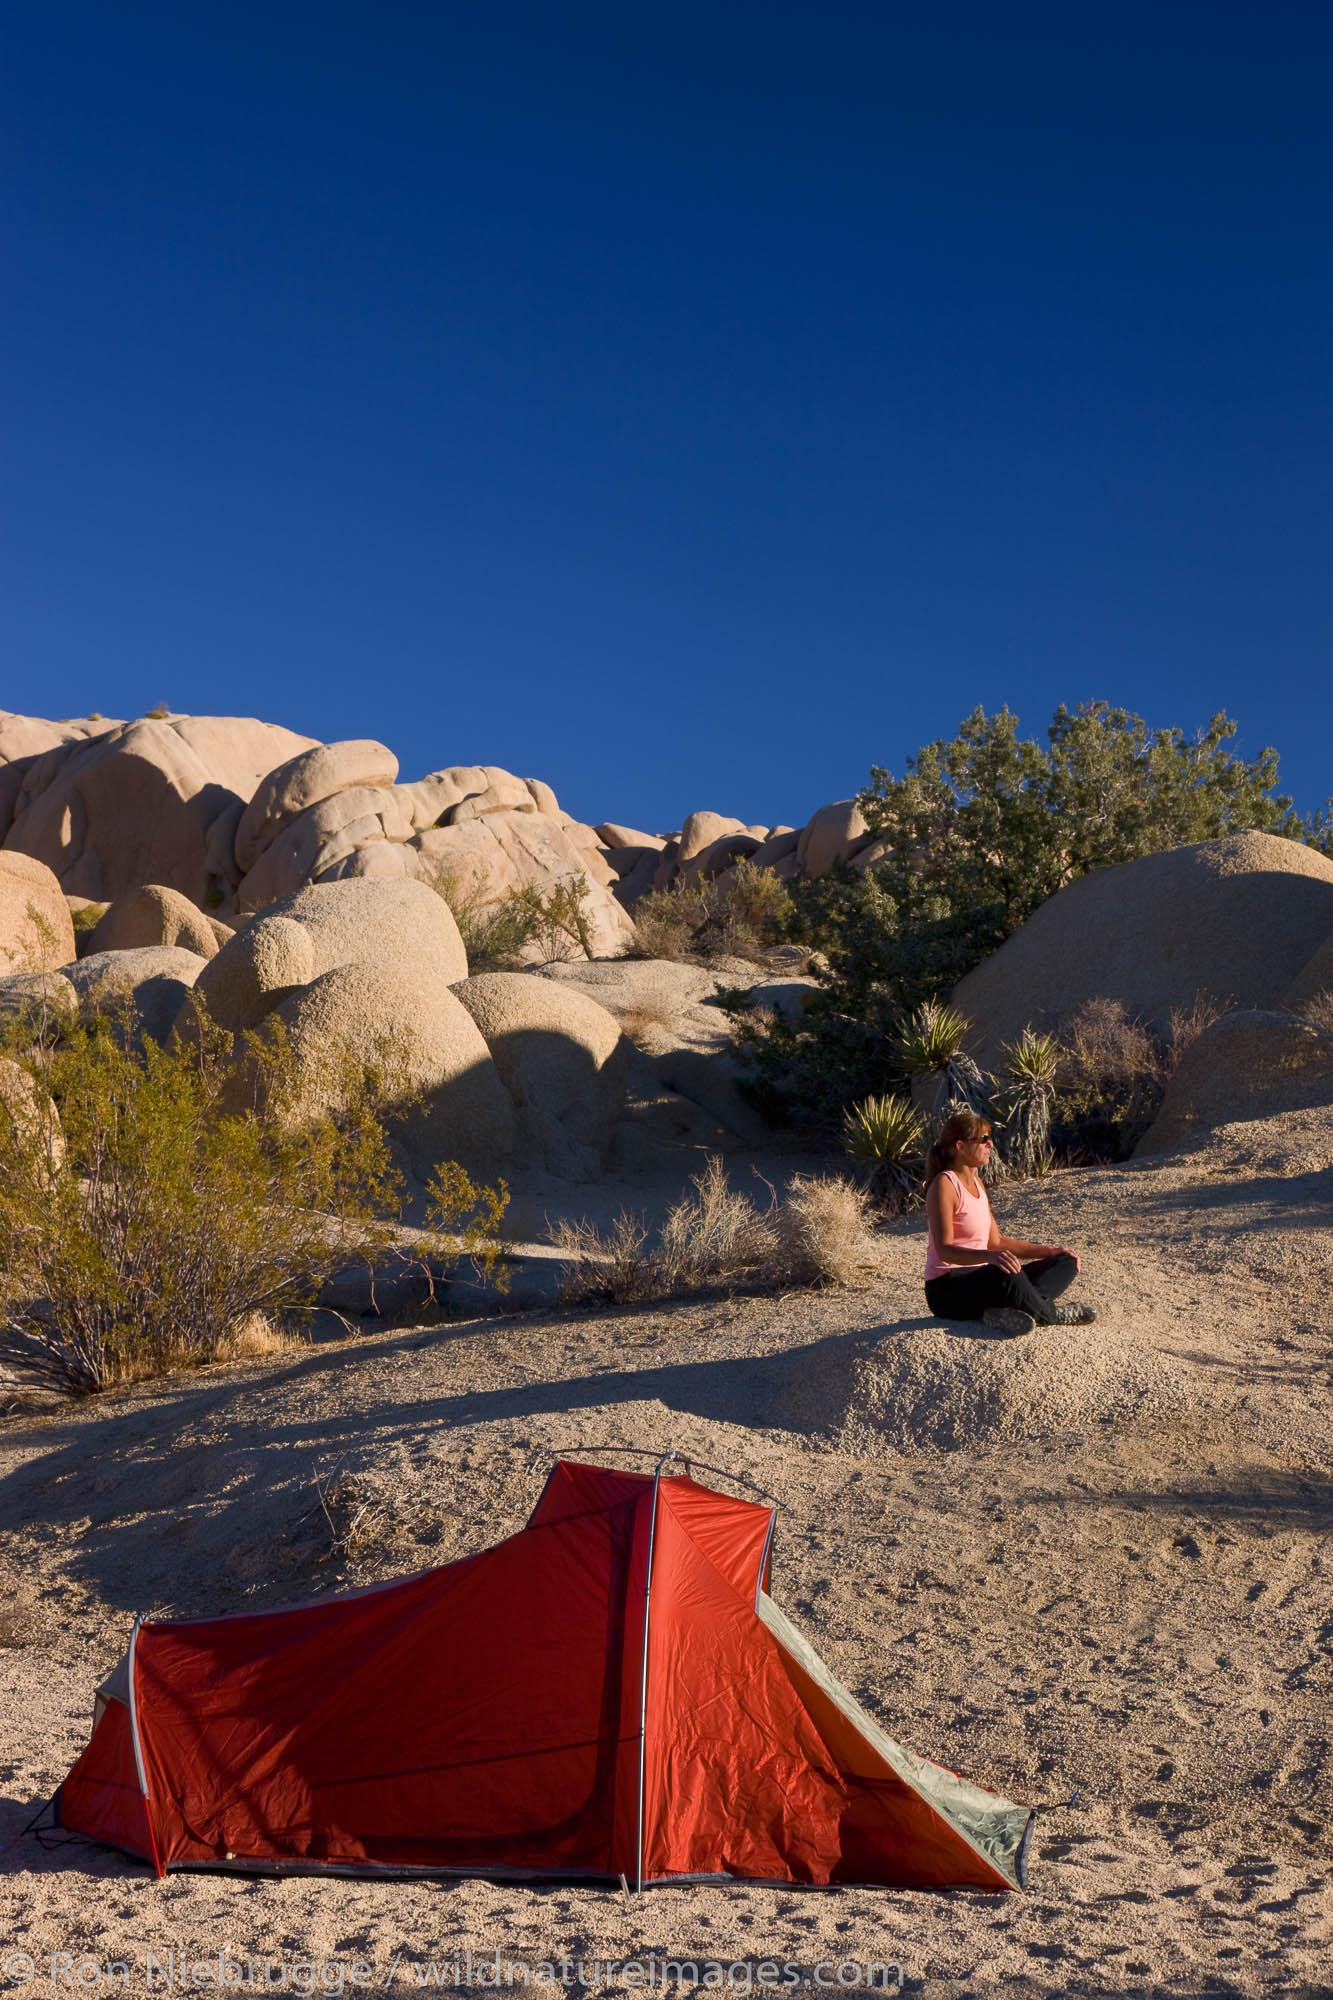 Jumbo Rocks Campground, Joshua Tree National Park, California. (model released)